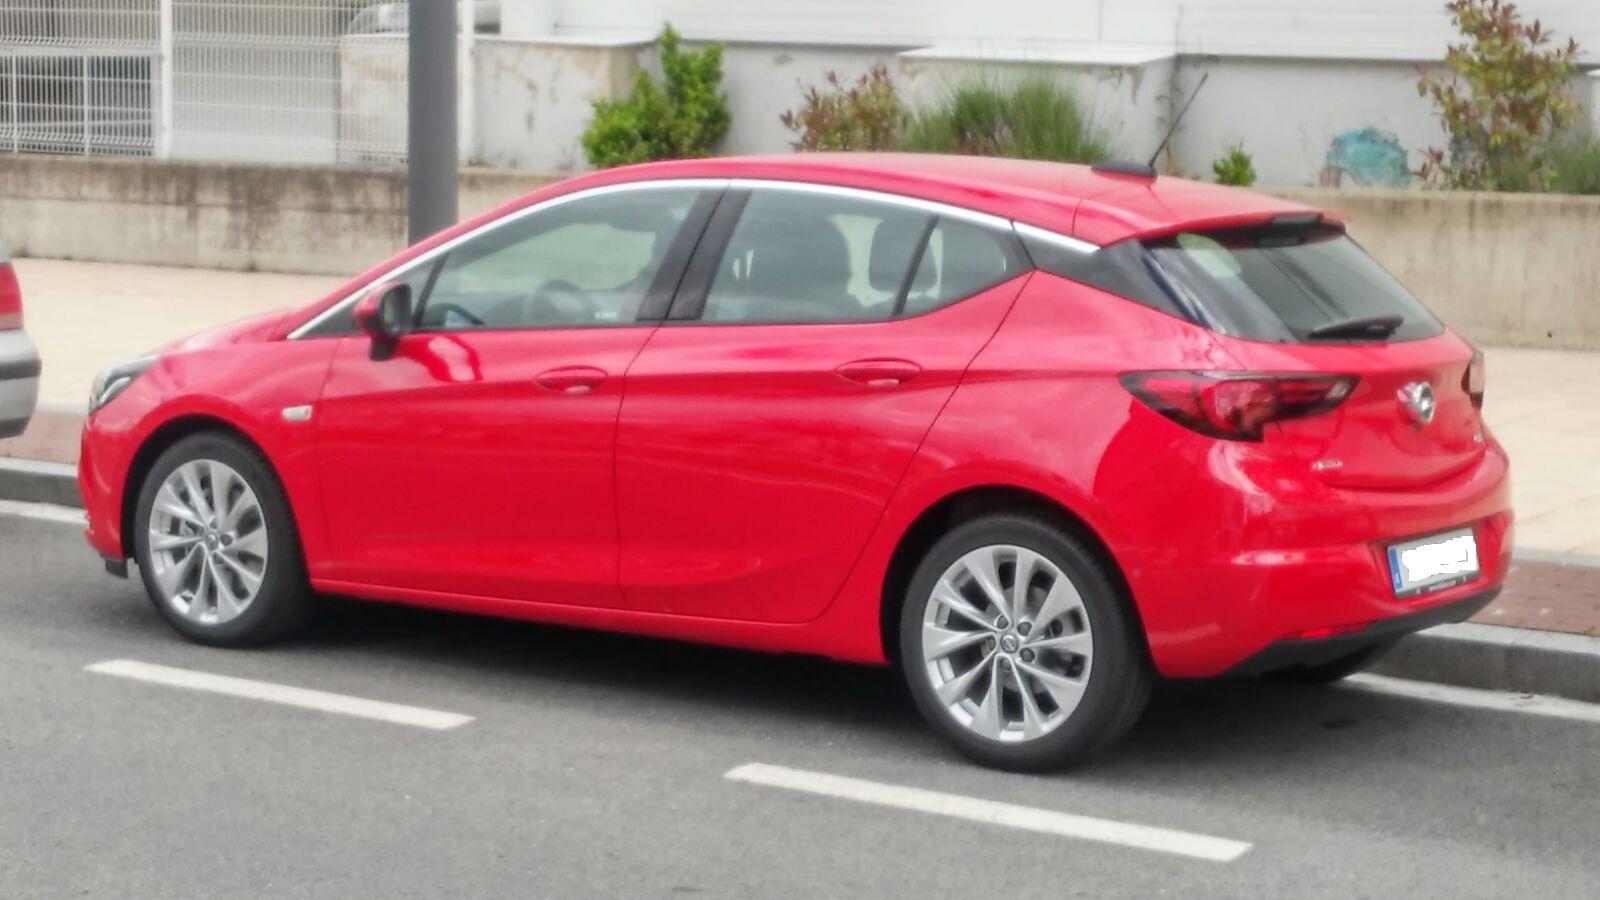 Mi Opel Astra K 1.6 CDTI 110cv Dynamic Rojo pasión (FOTOS ACTUALES) BvXkIv